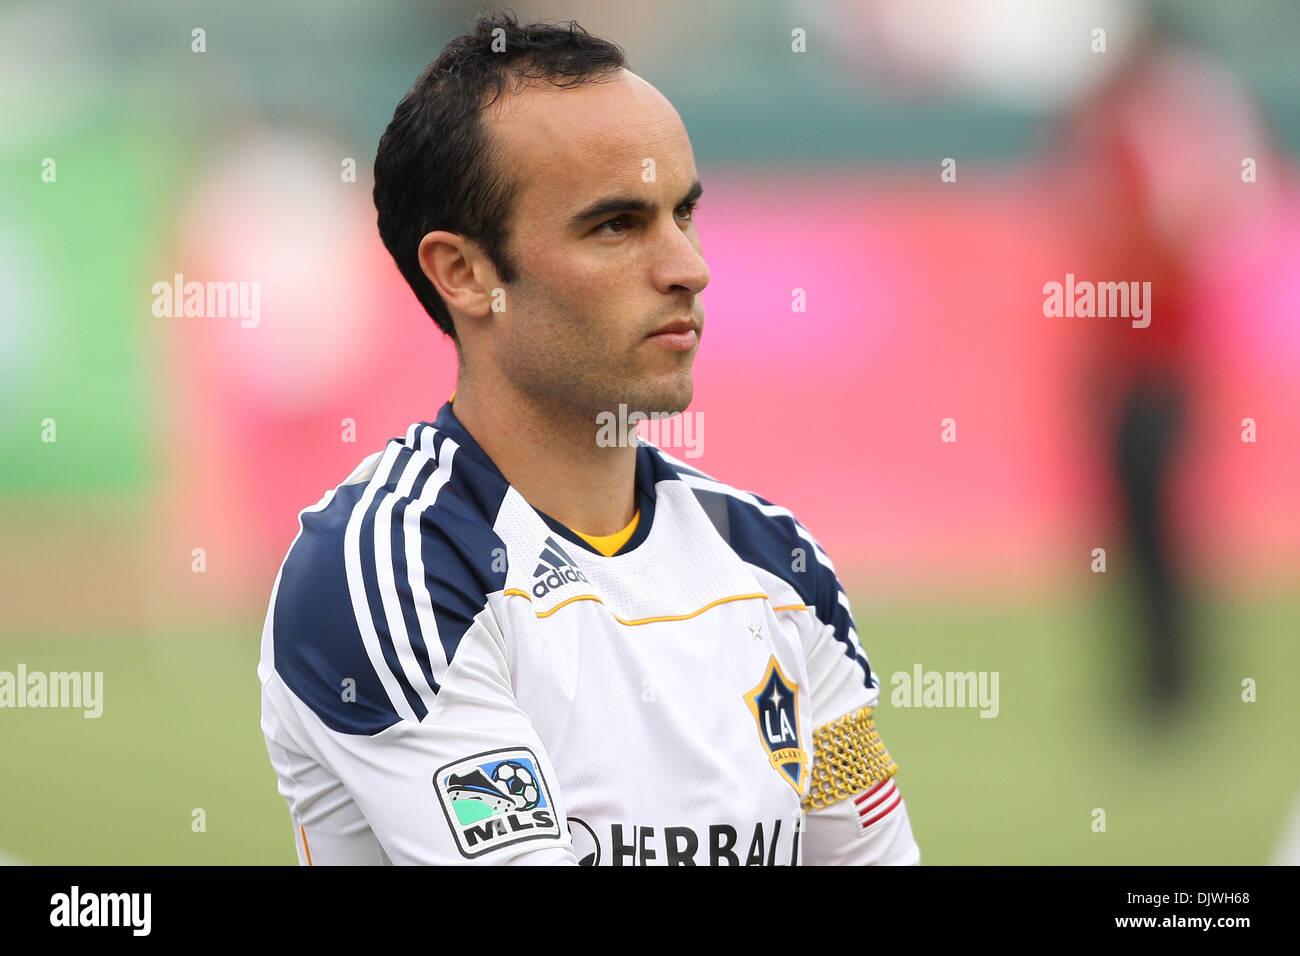 bd18daee8 Los Angeles Galaxy Mls Soccer Team Stock Photos   Los Angeles Galaxy ...